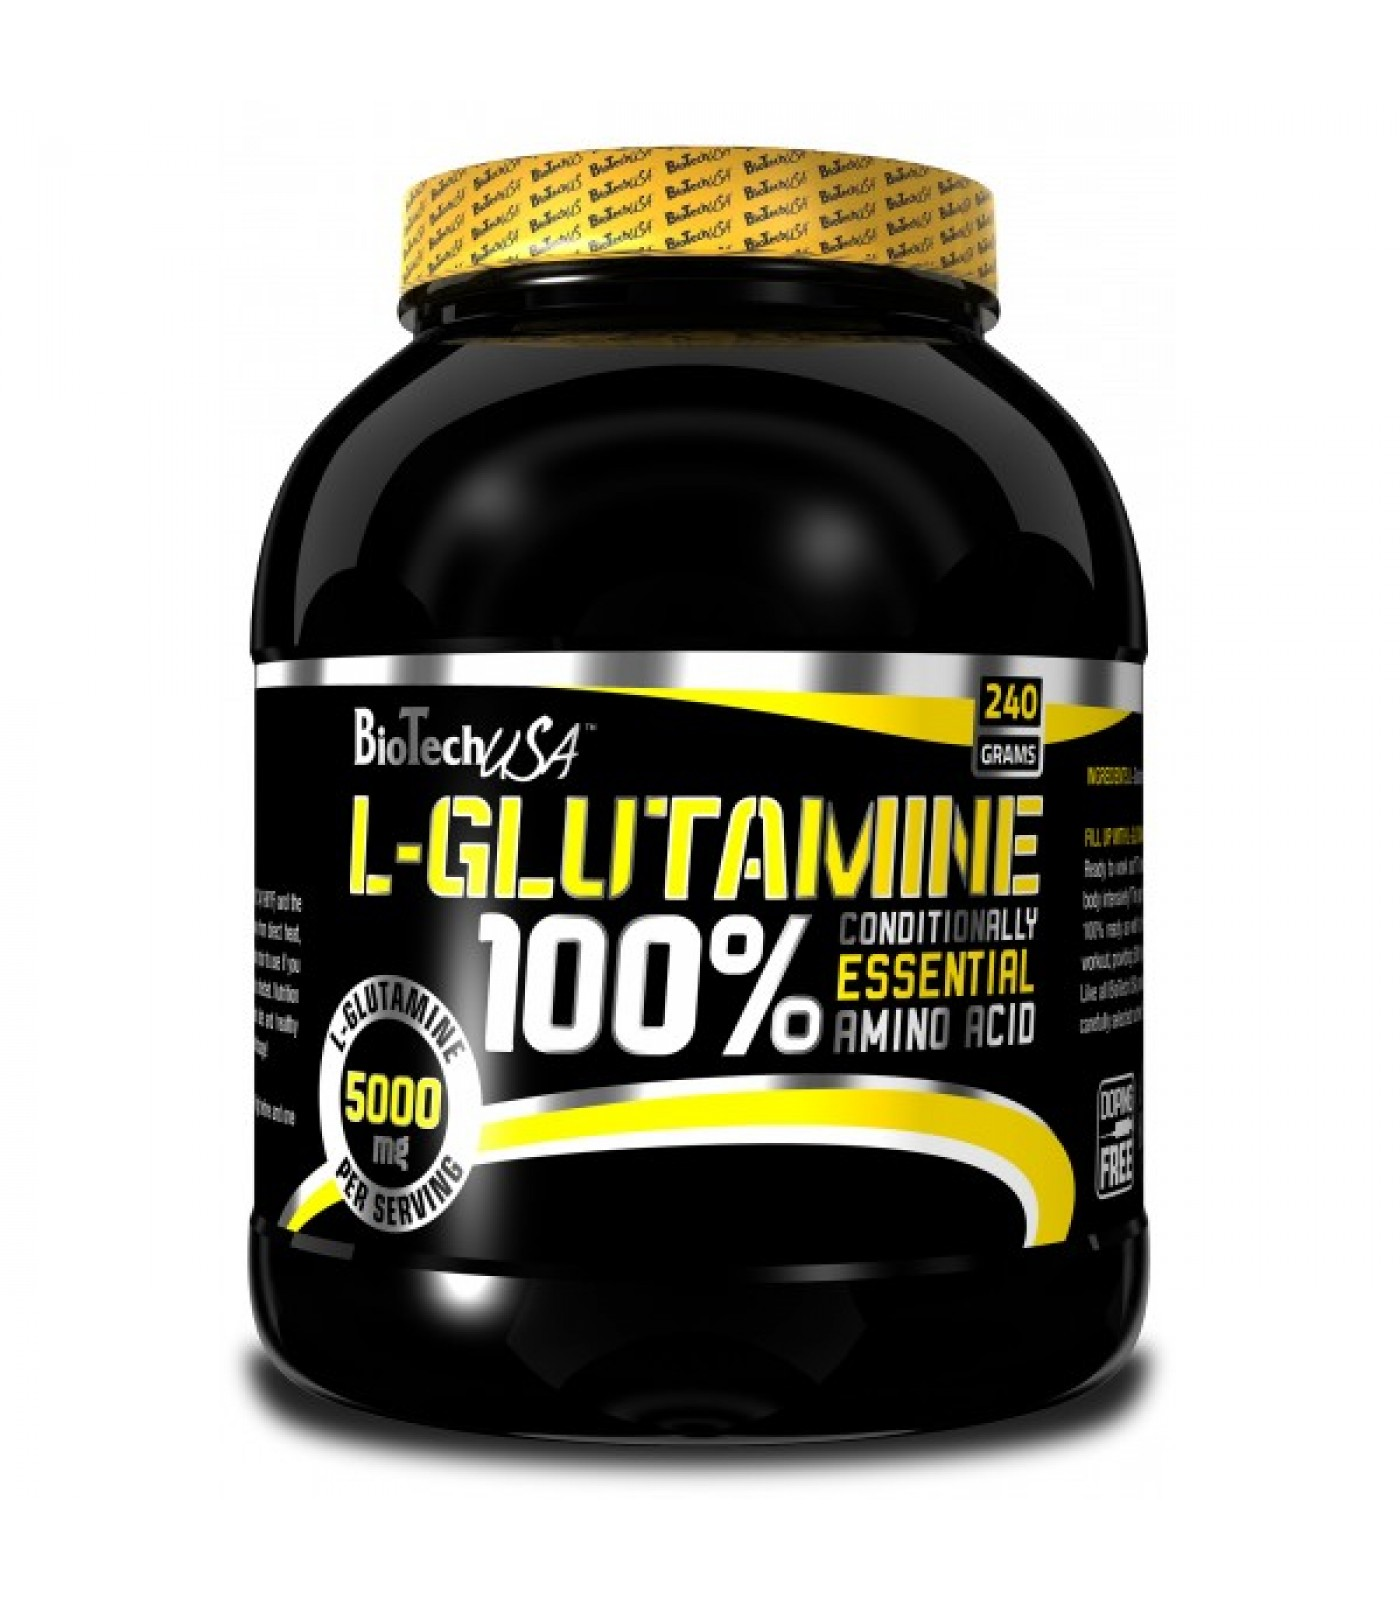 BioTech - L-Glutamine / 240 gr.